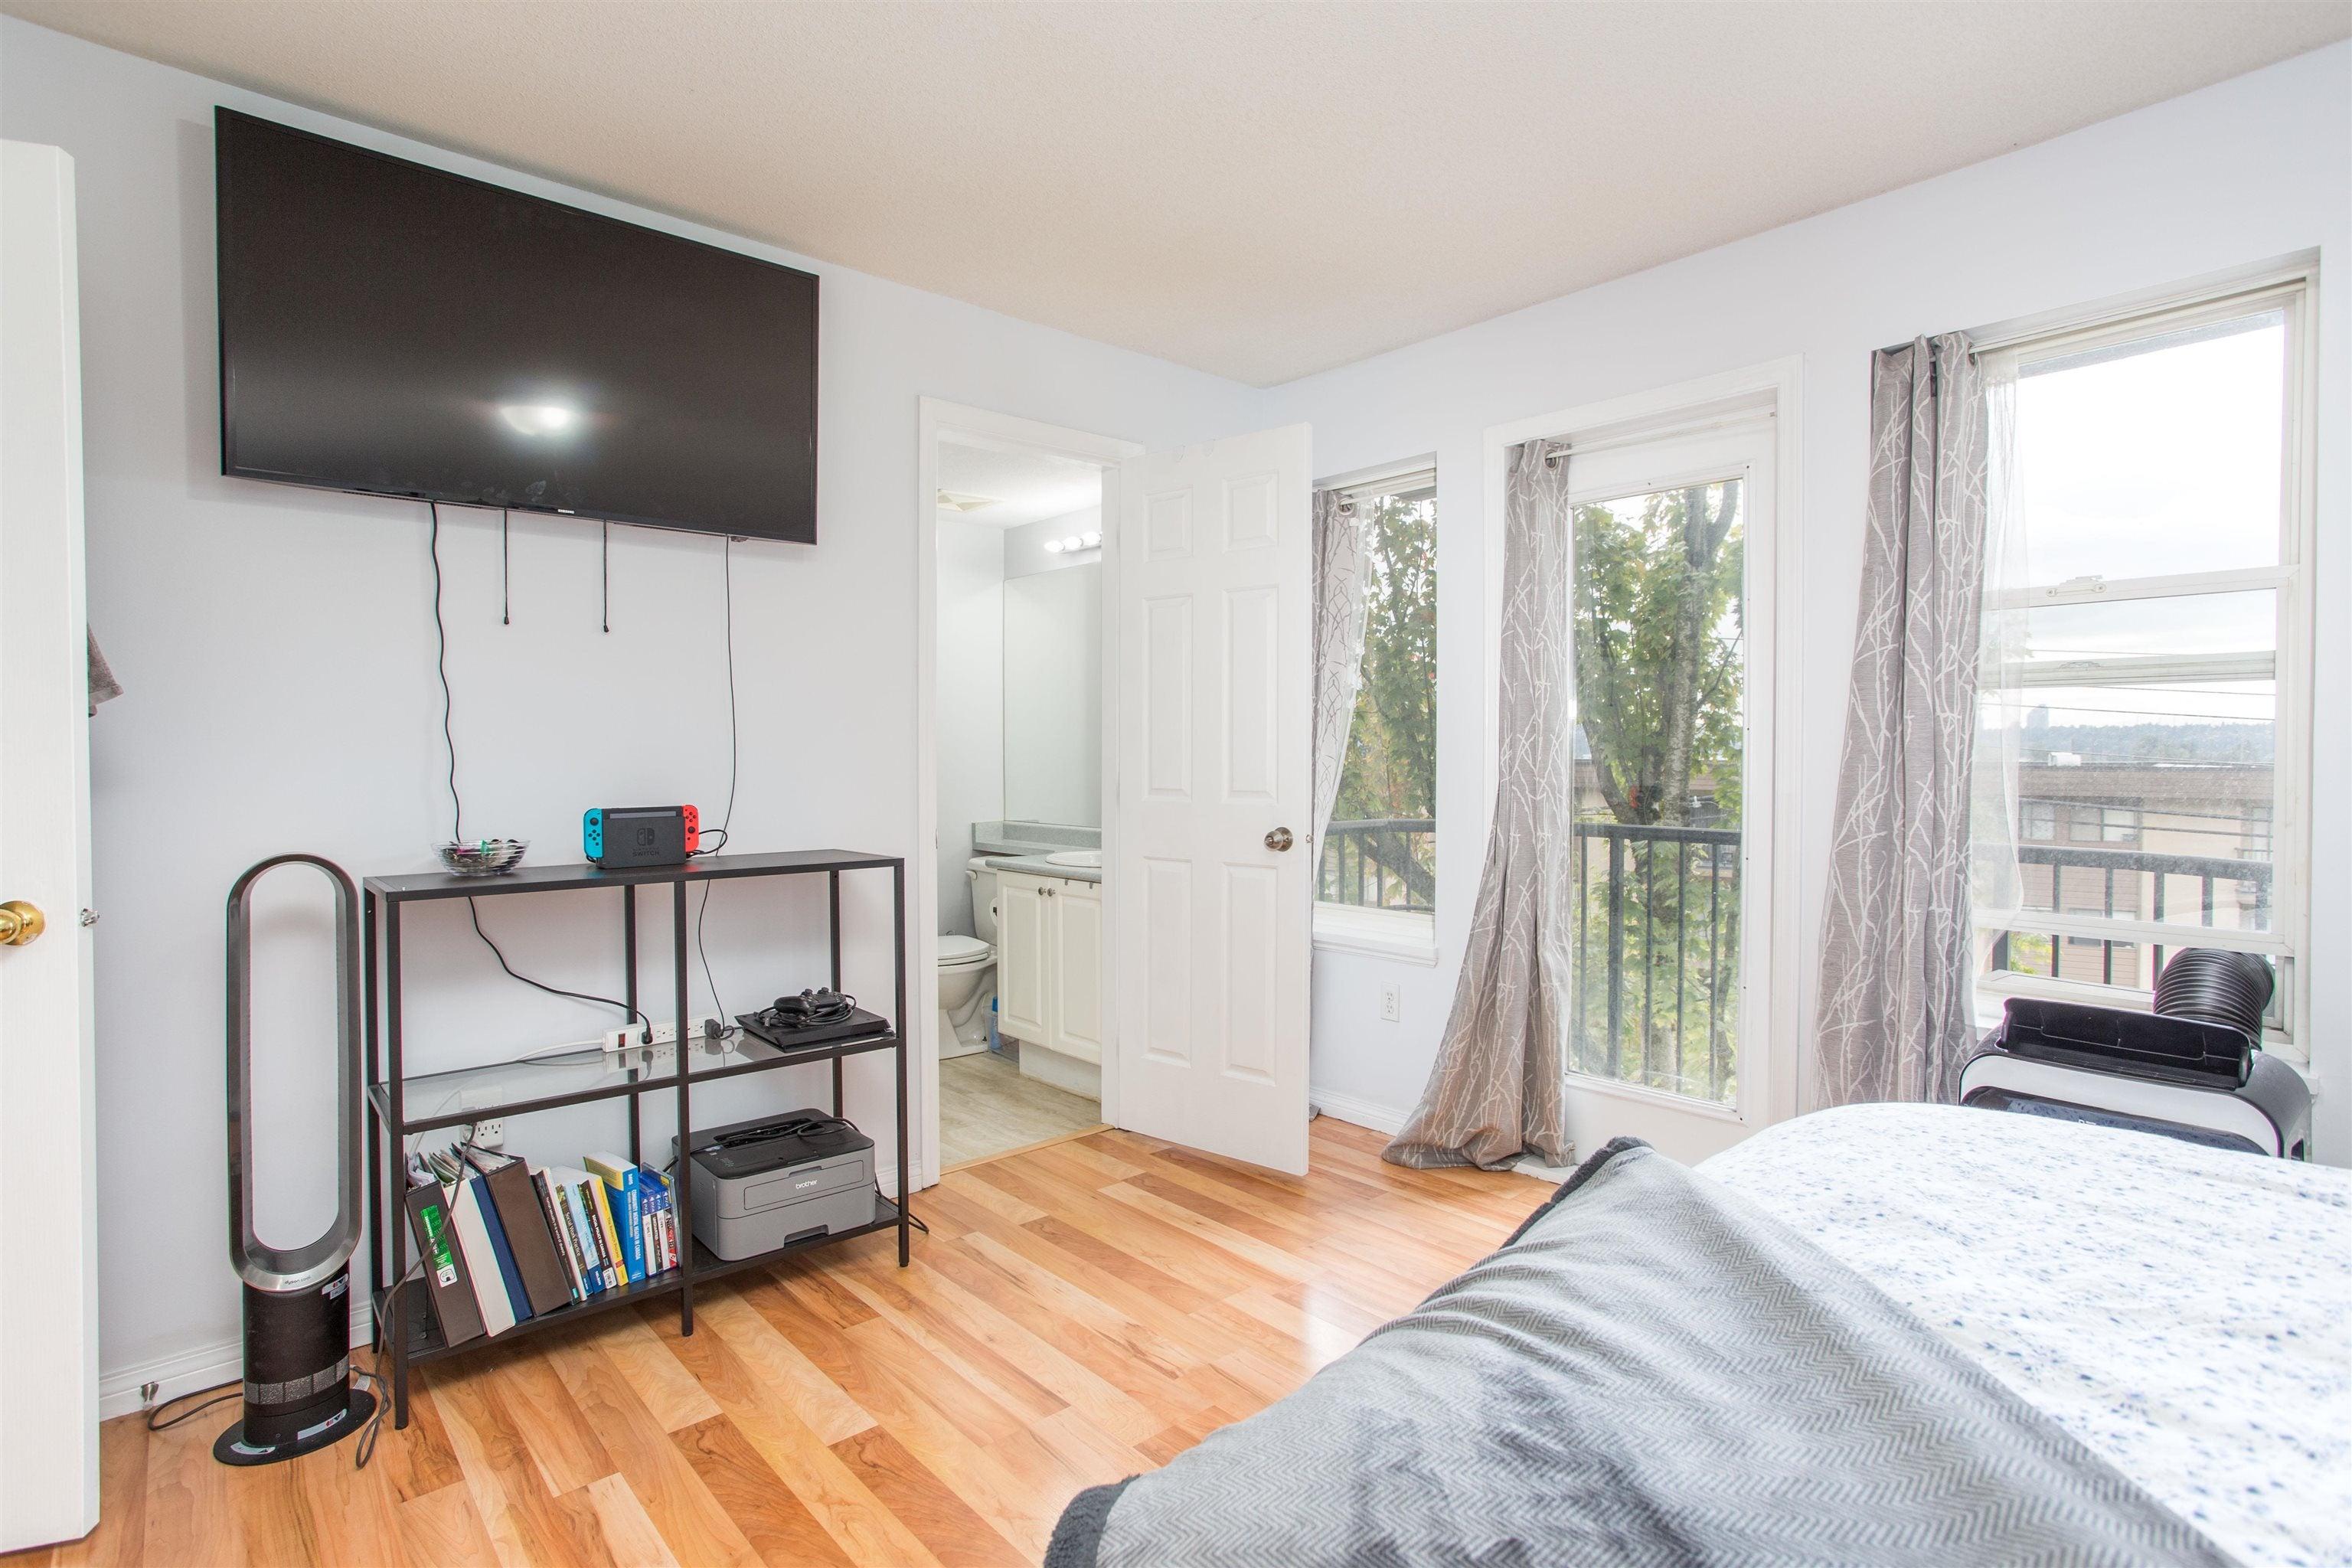 7 205 LEBLEU STREET - Maillardville Apartment/Condo for sale, 3 Bedrooms (R2625671) - #14